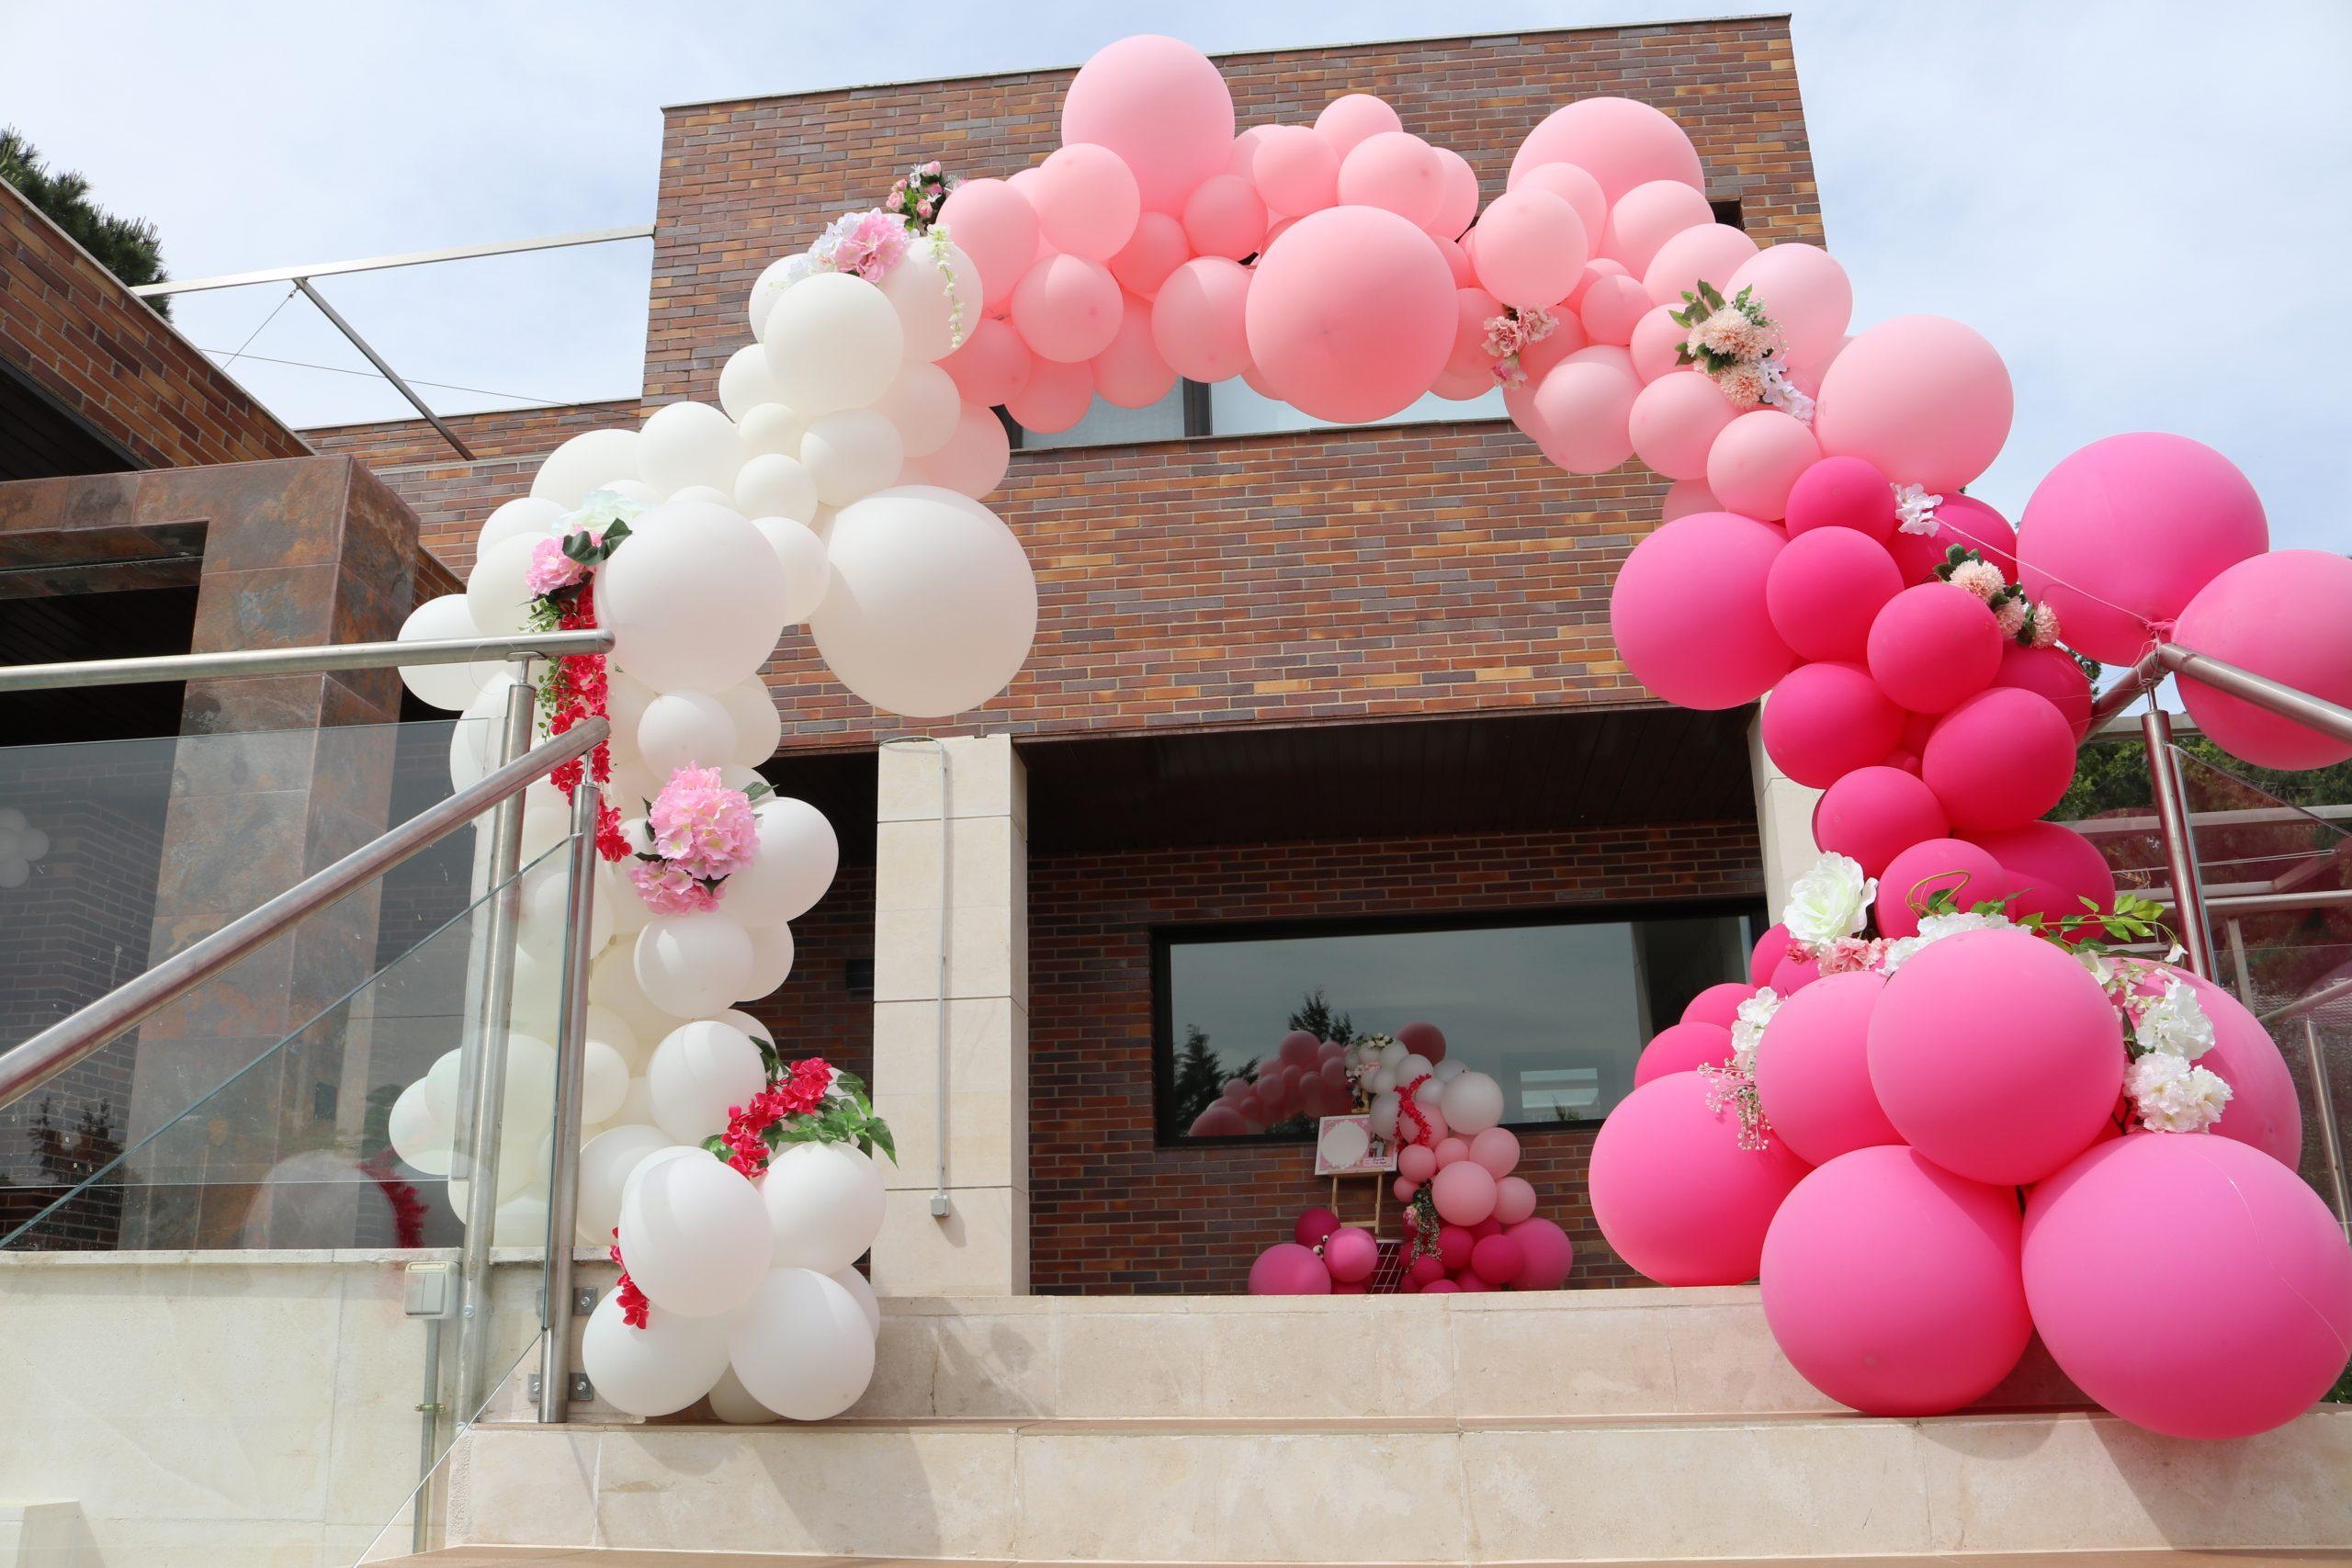 evento.love-weddingplanner-organizadoresdebodas-comunion-decoracionconglobos-arcoconglobos